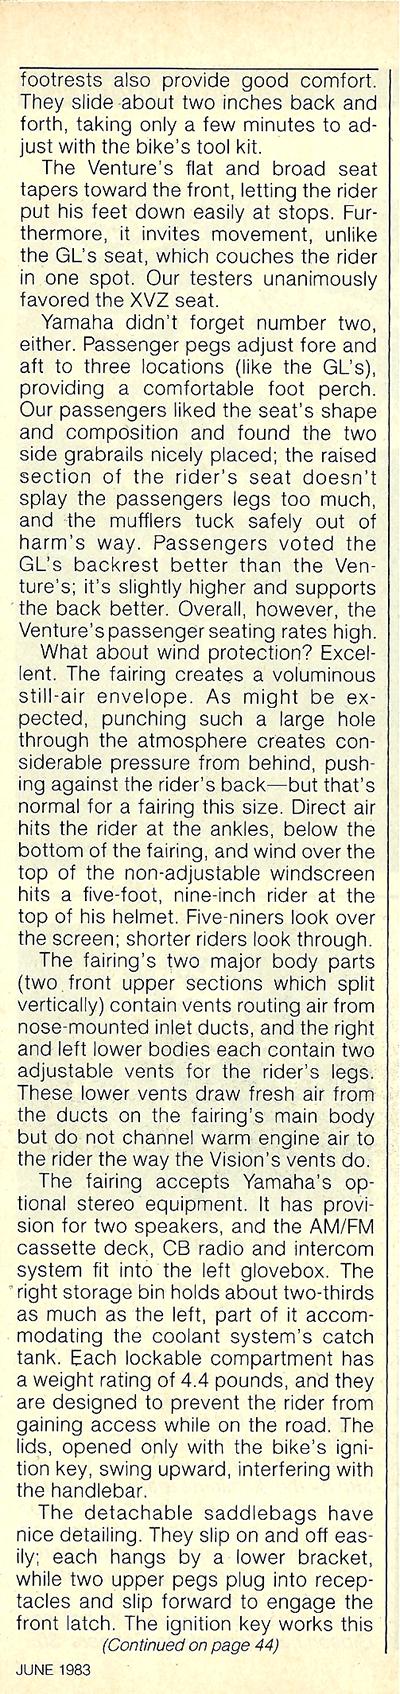 1983 Yamaha XVZ12TK Venture road test 10.jpg